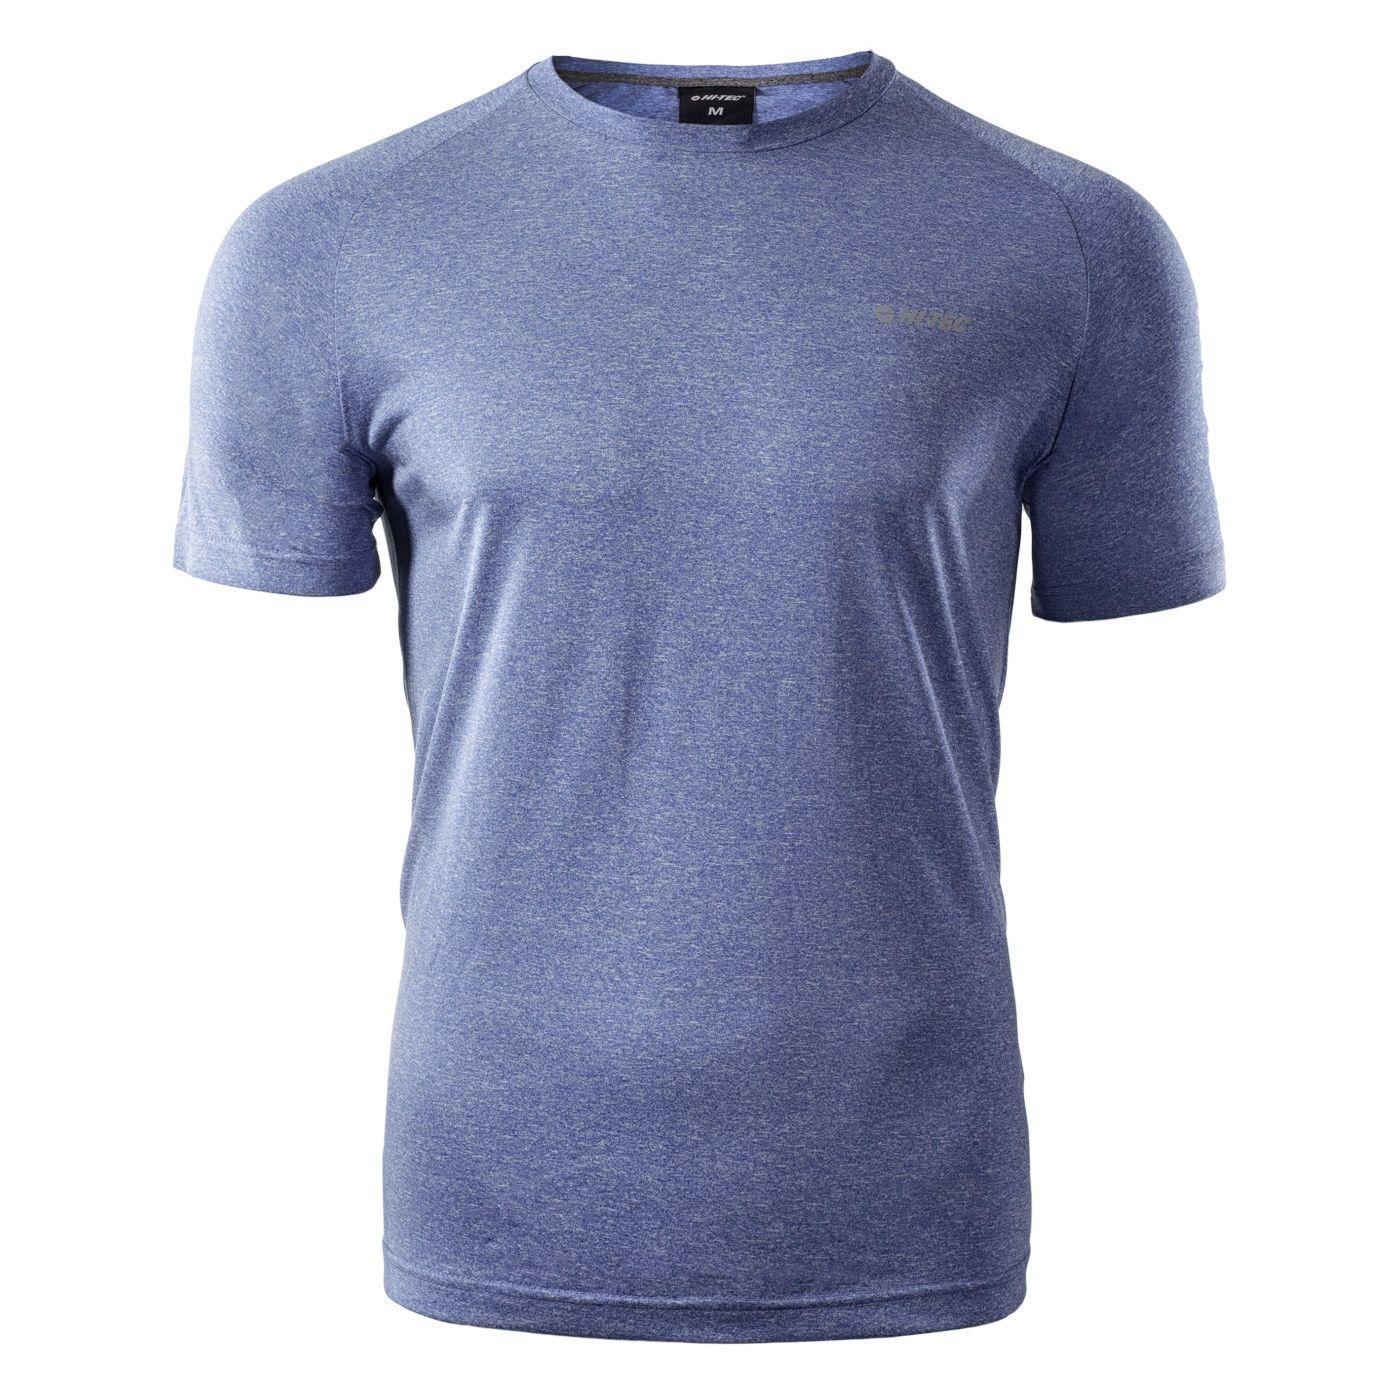 Męska koszulka TABAH VICTORIA BLUE MELANGE Hi Tec